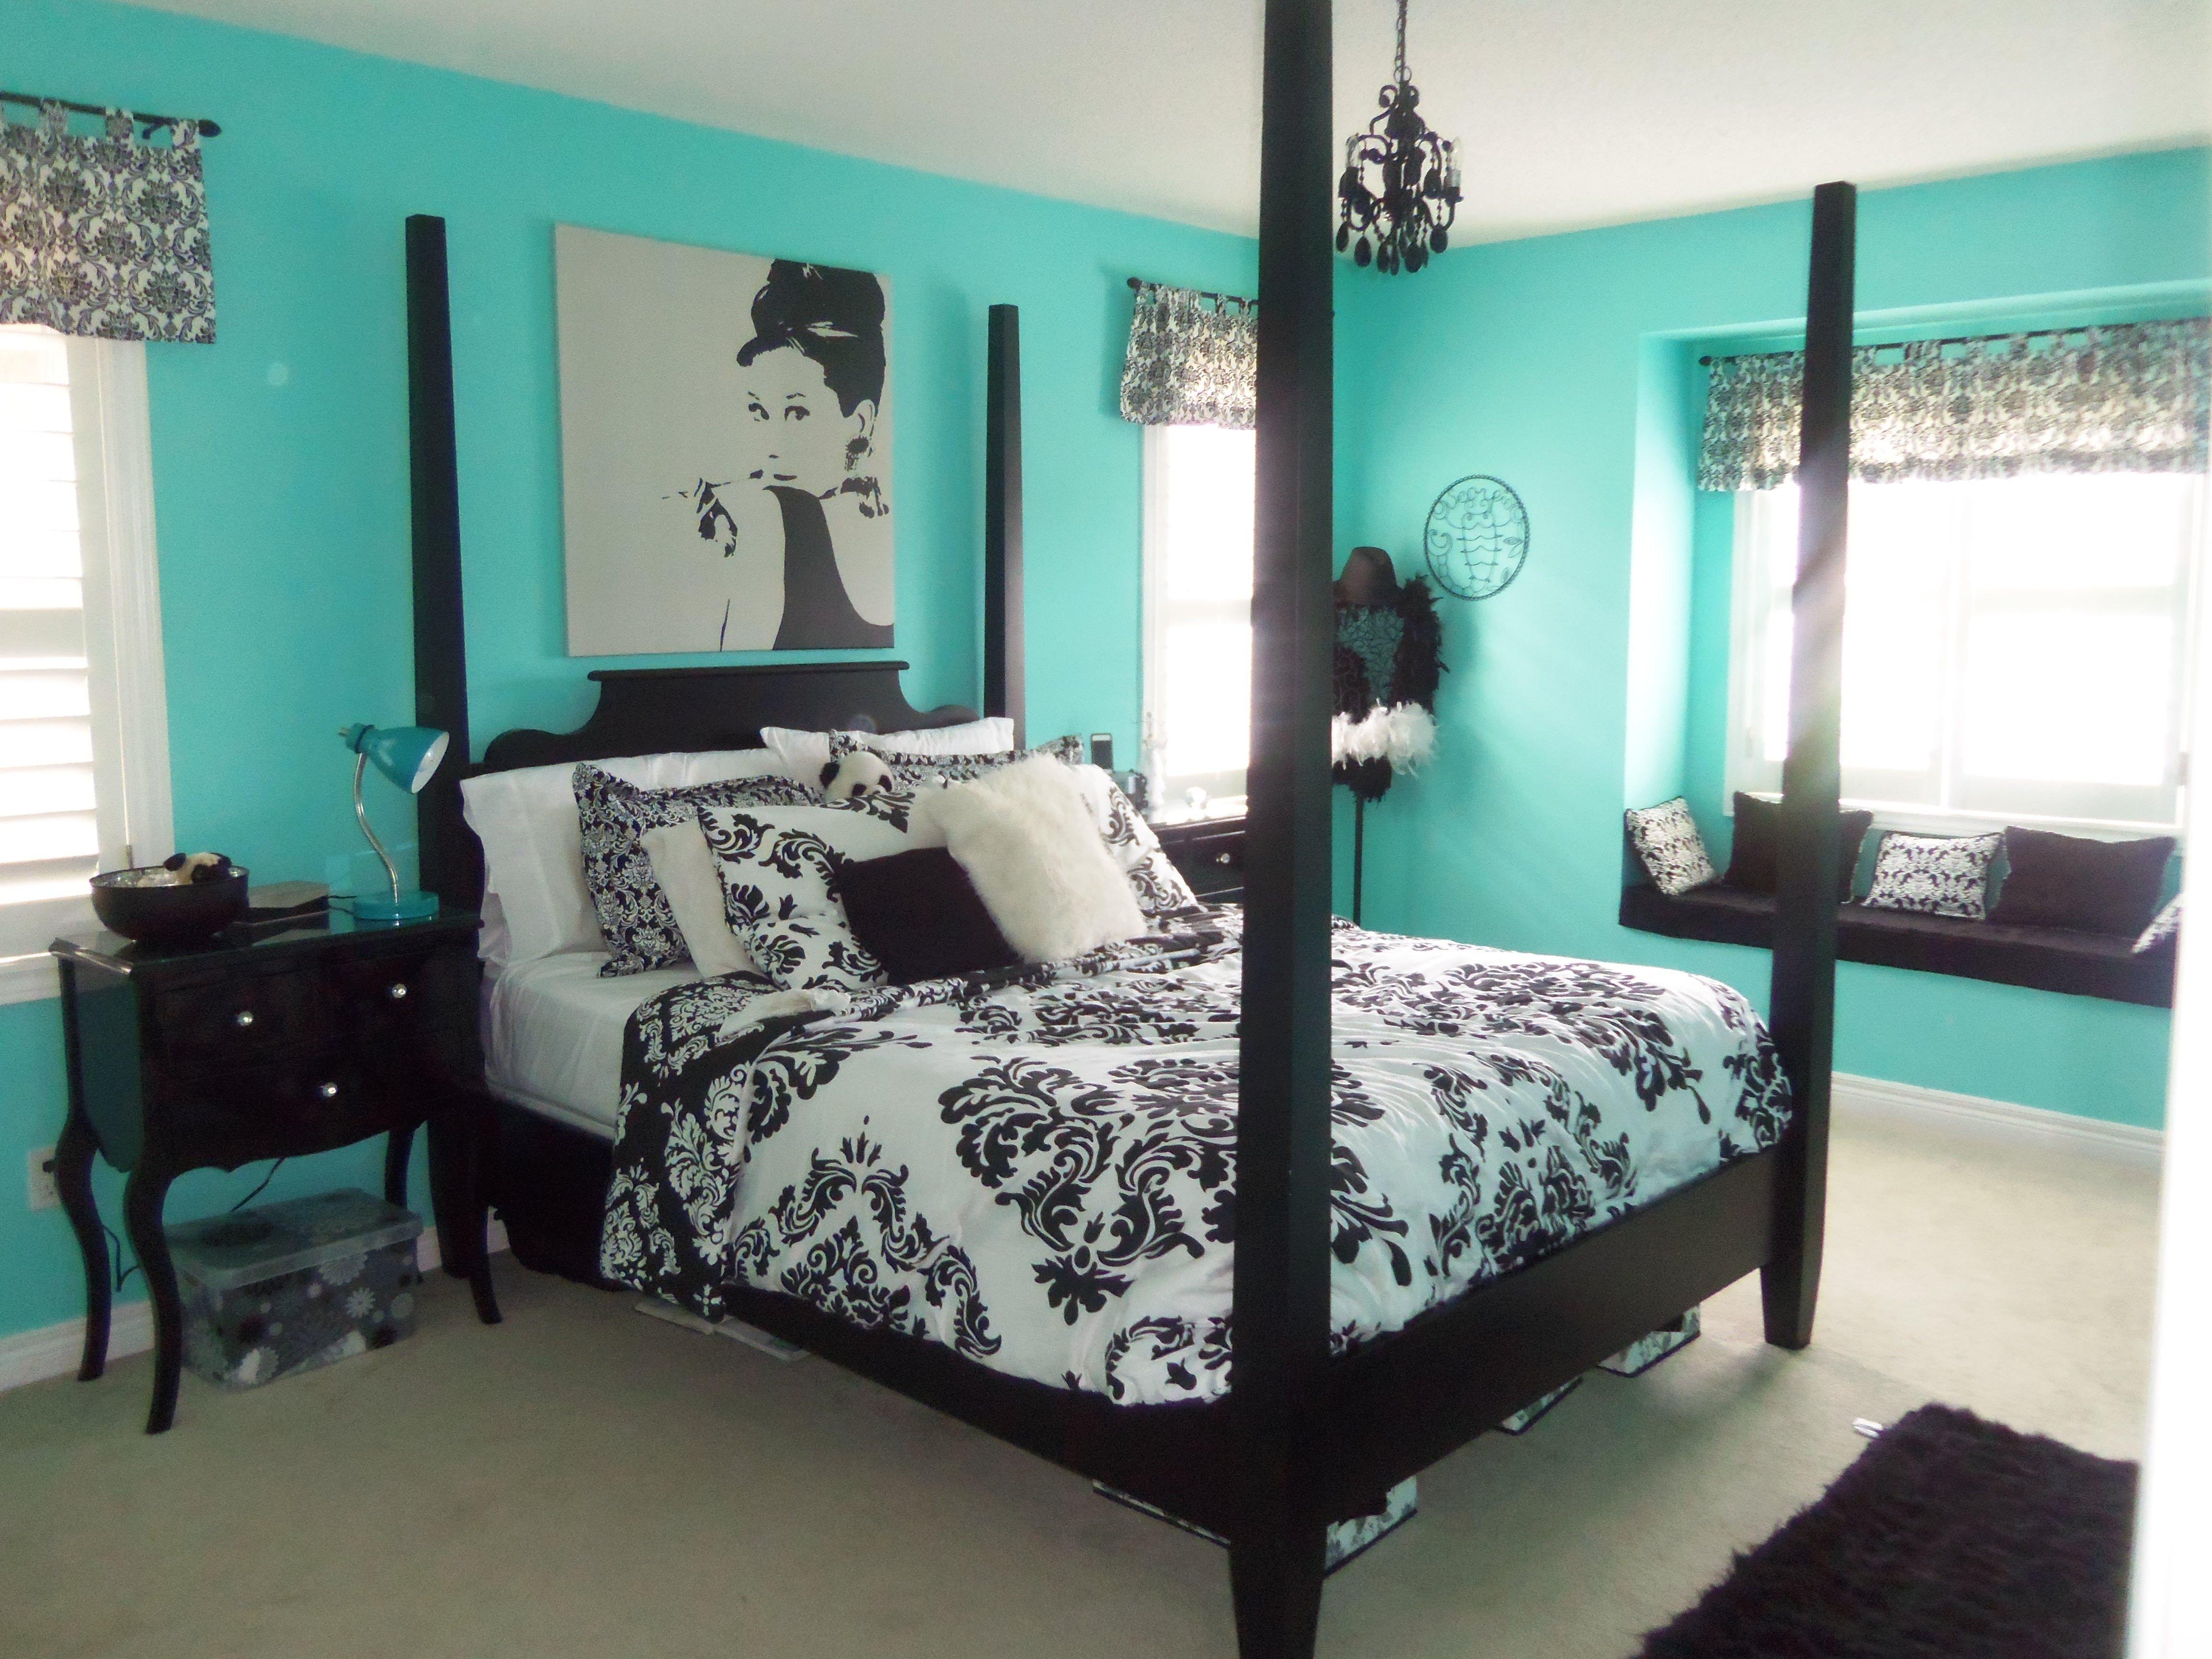 10 Lovable Blue And Black Bedroom Ideas black bedroom ideas inspiration for master bedroom designs 1 2020